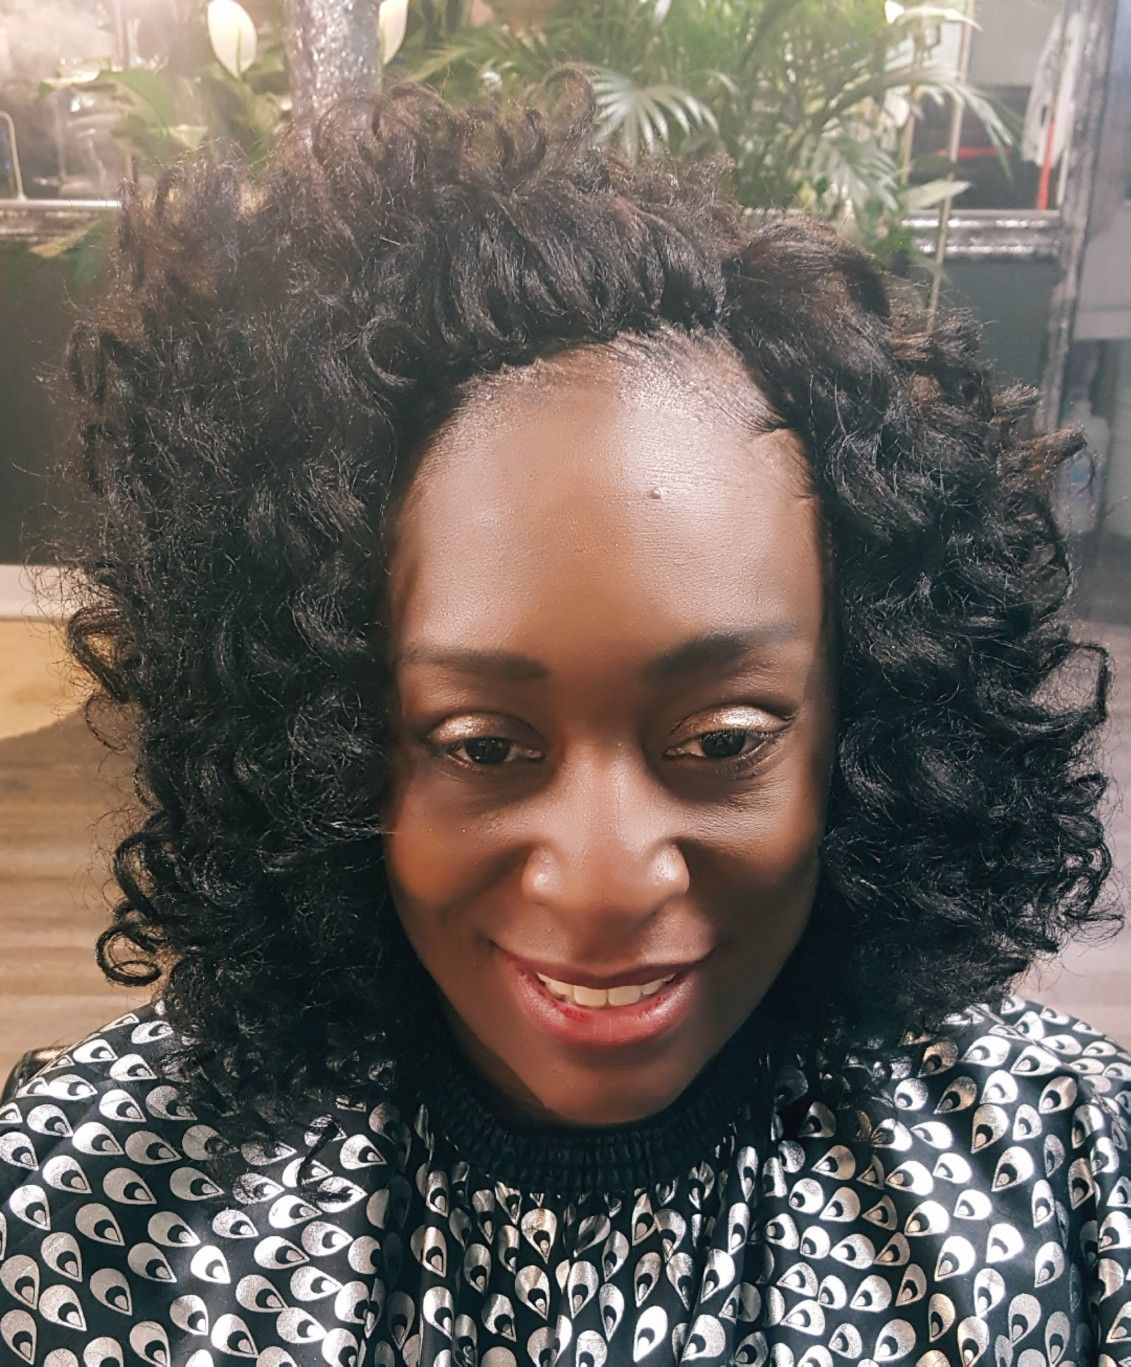 Jamaican Bob Hairstyle: Crochet Hair Styles, Braided Hairstyles